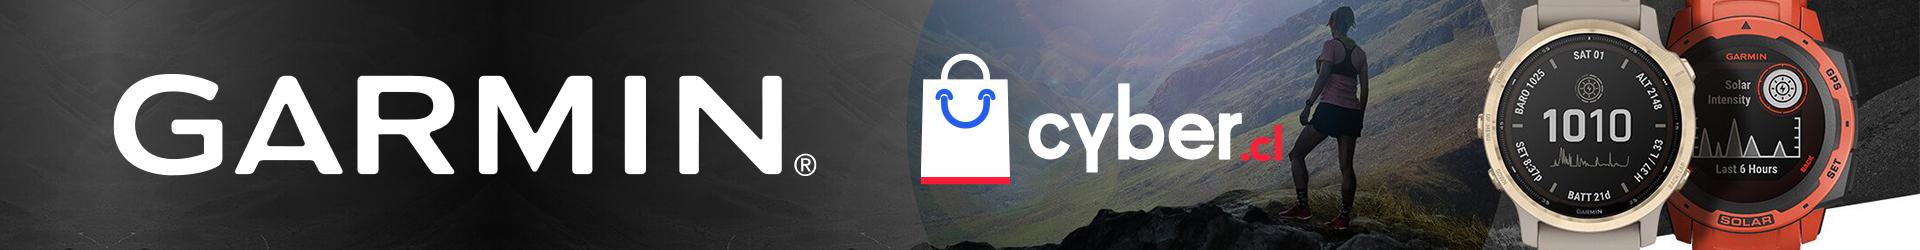 ofertas garmin cyber 2021